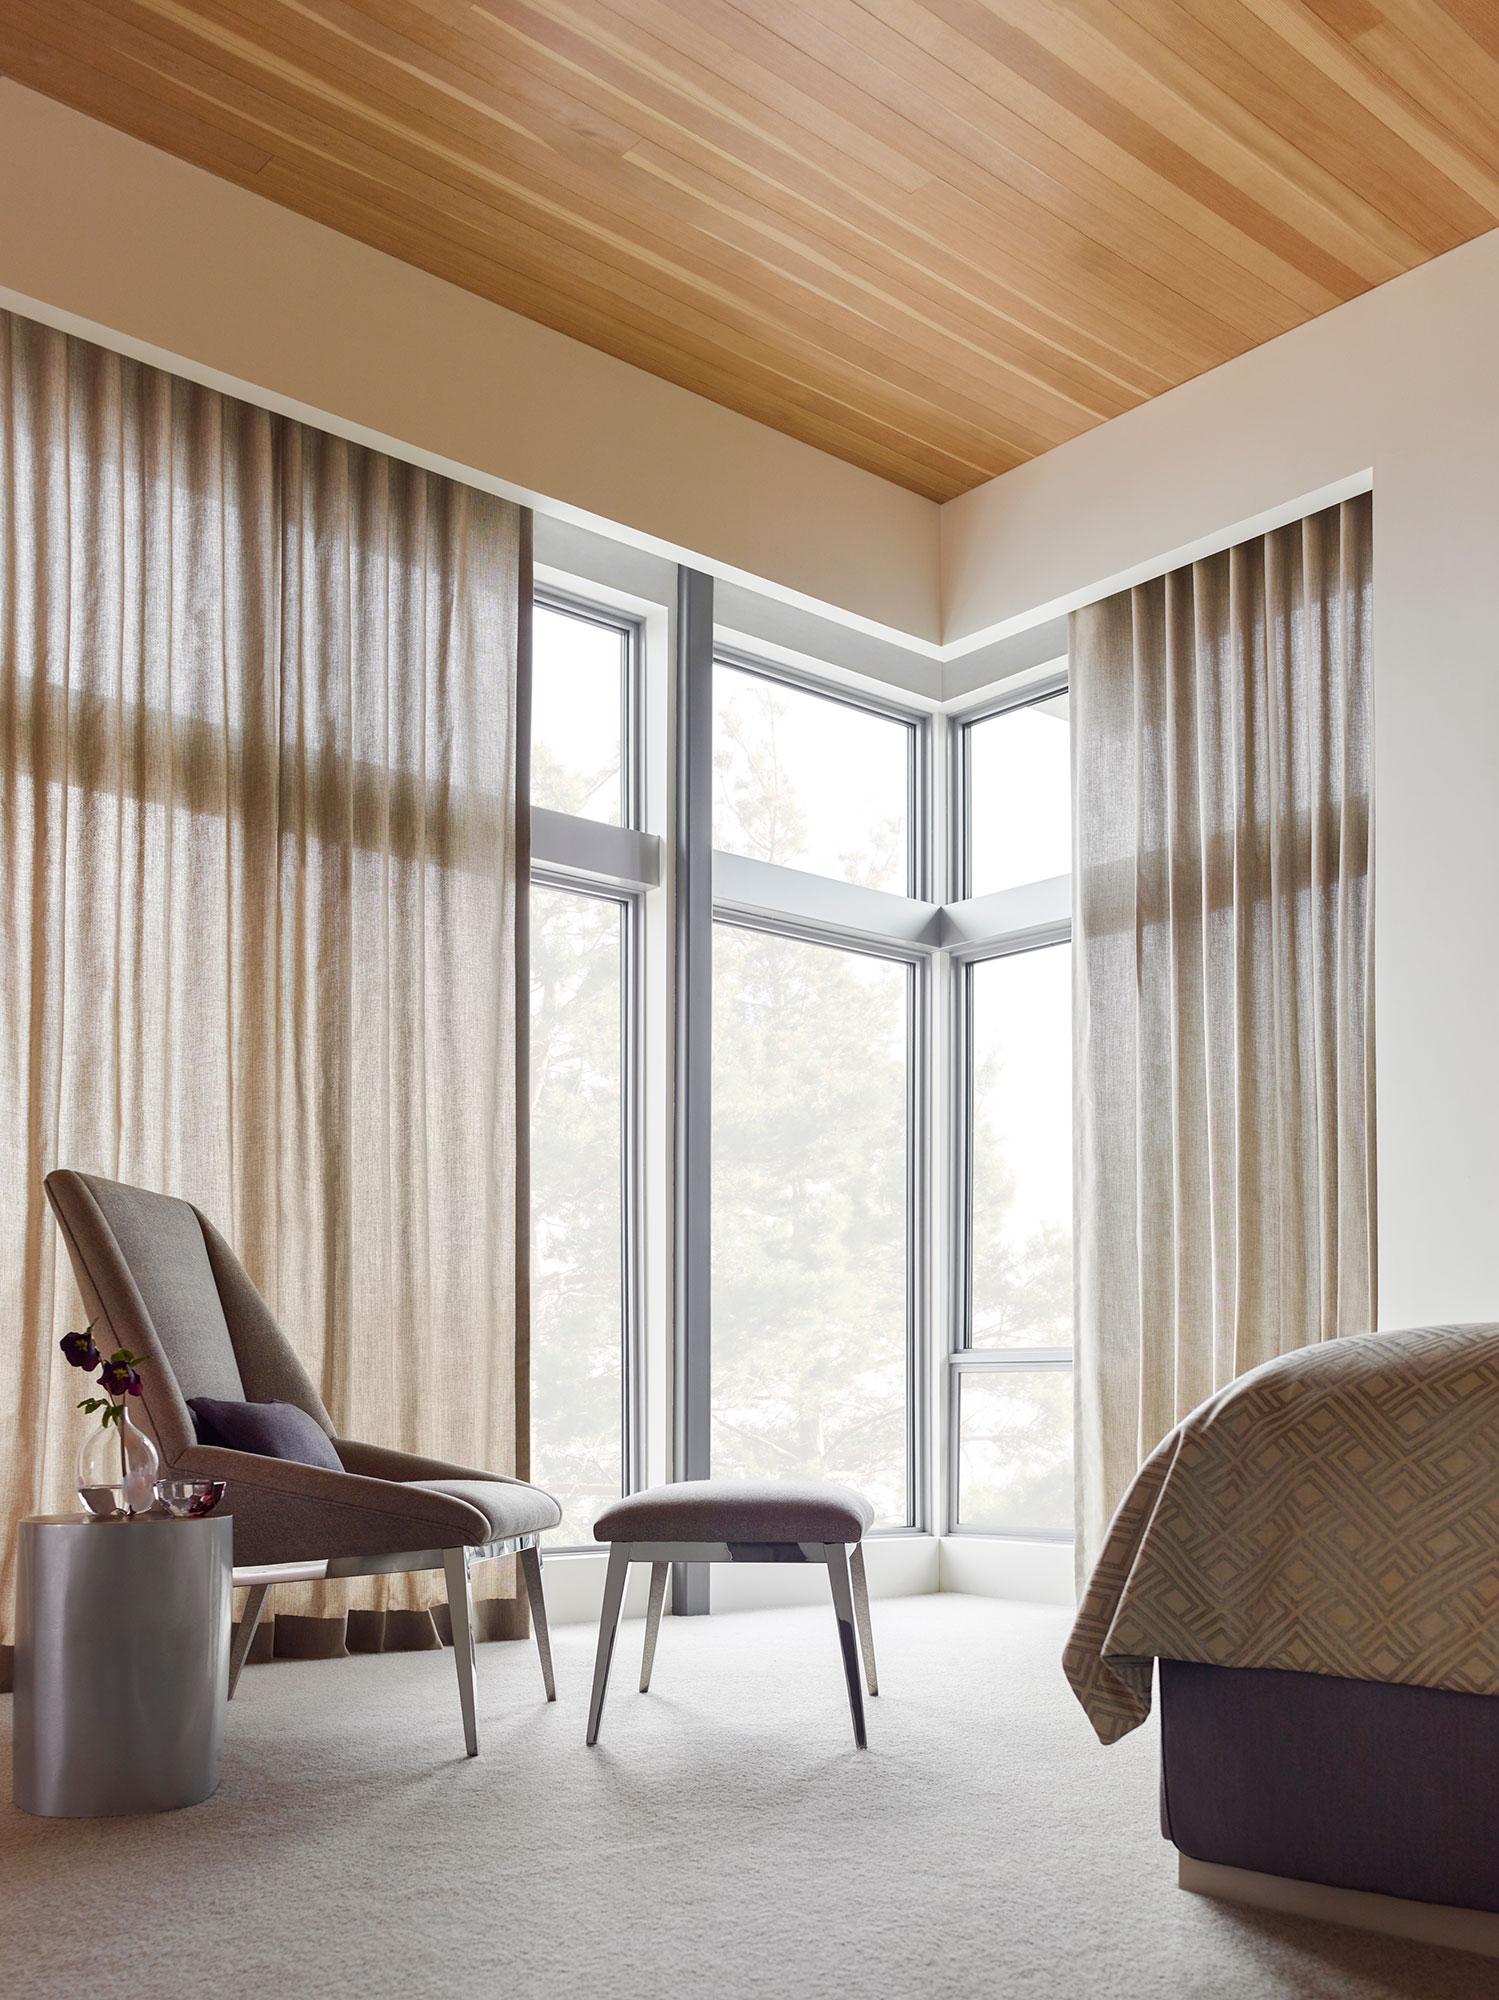 The Shade Store Sunbrella Collaboration For Window